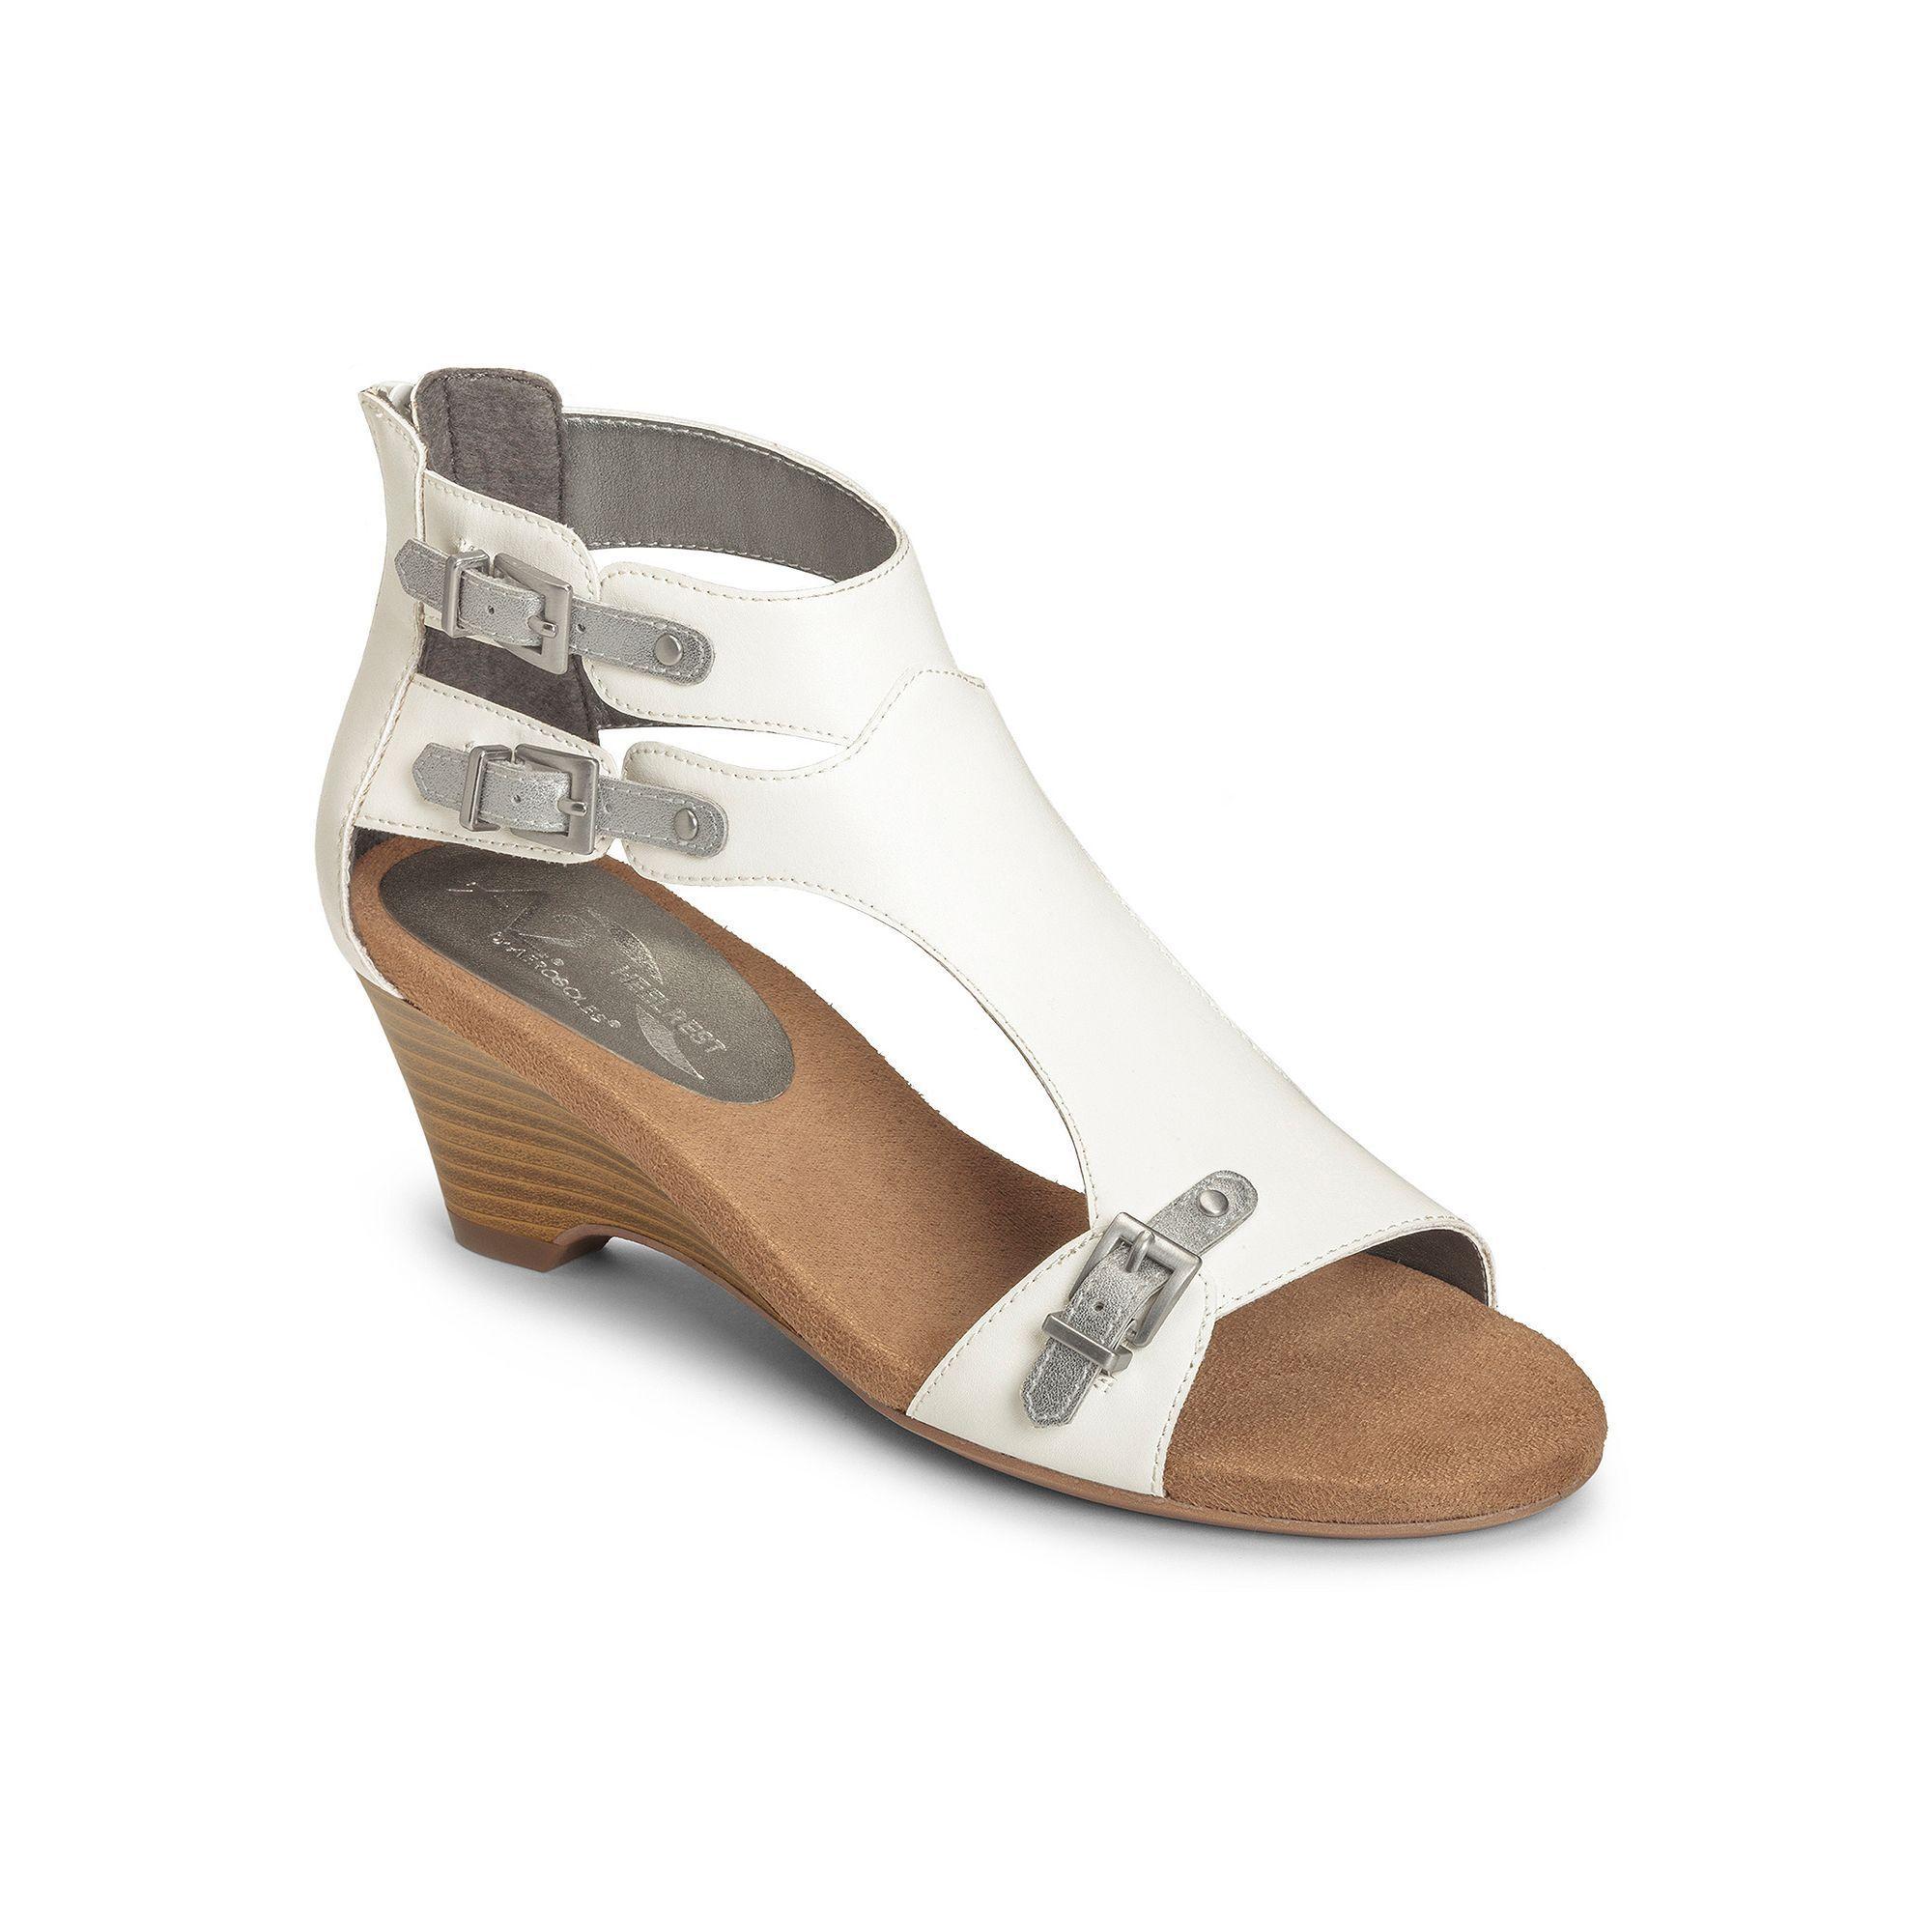 A2 by Aerosoles Mayflower Women's Wedge Sandals